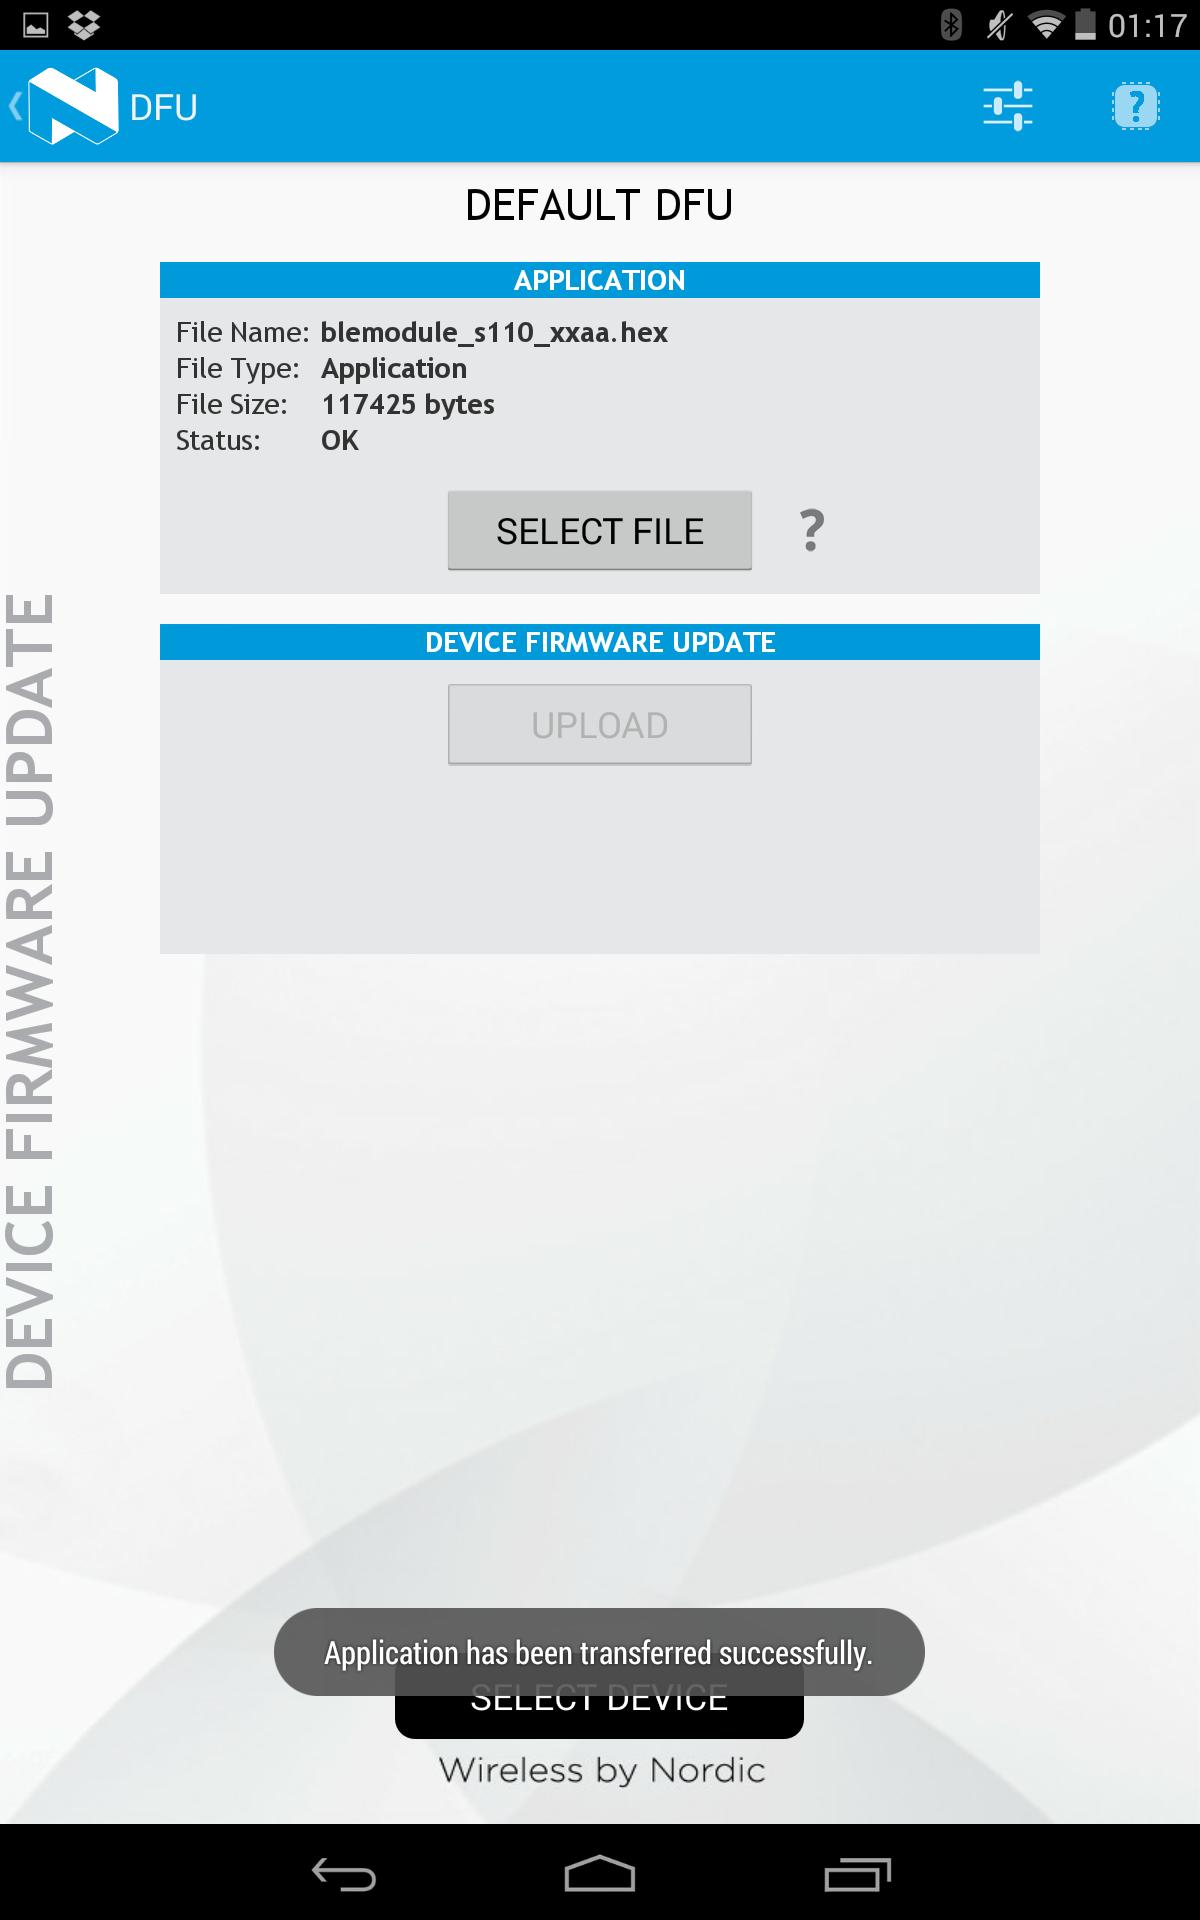 adafruit_products_Screenshot_2014-09-25-01-17-46.png